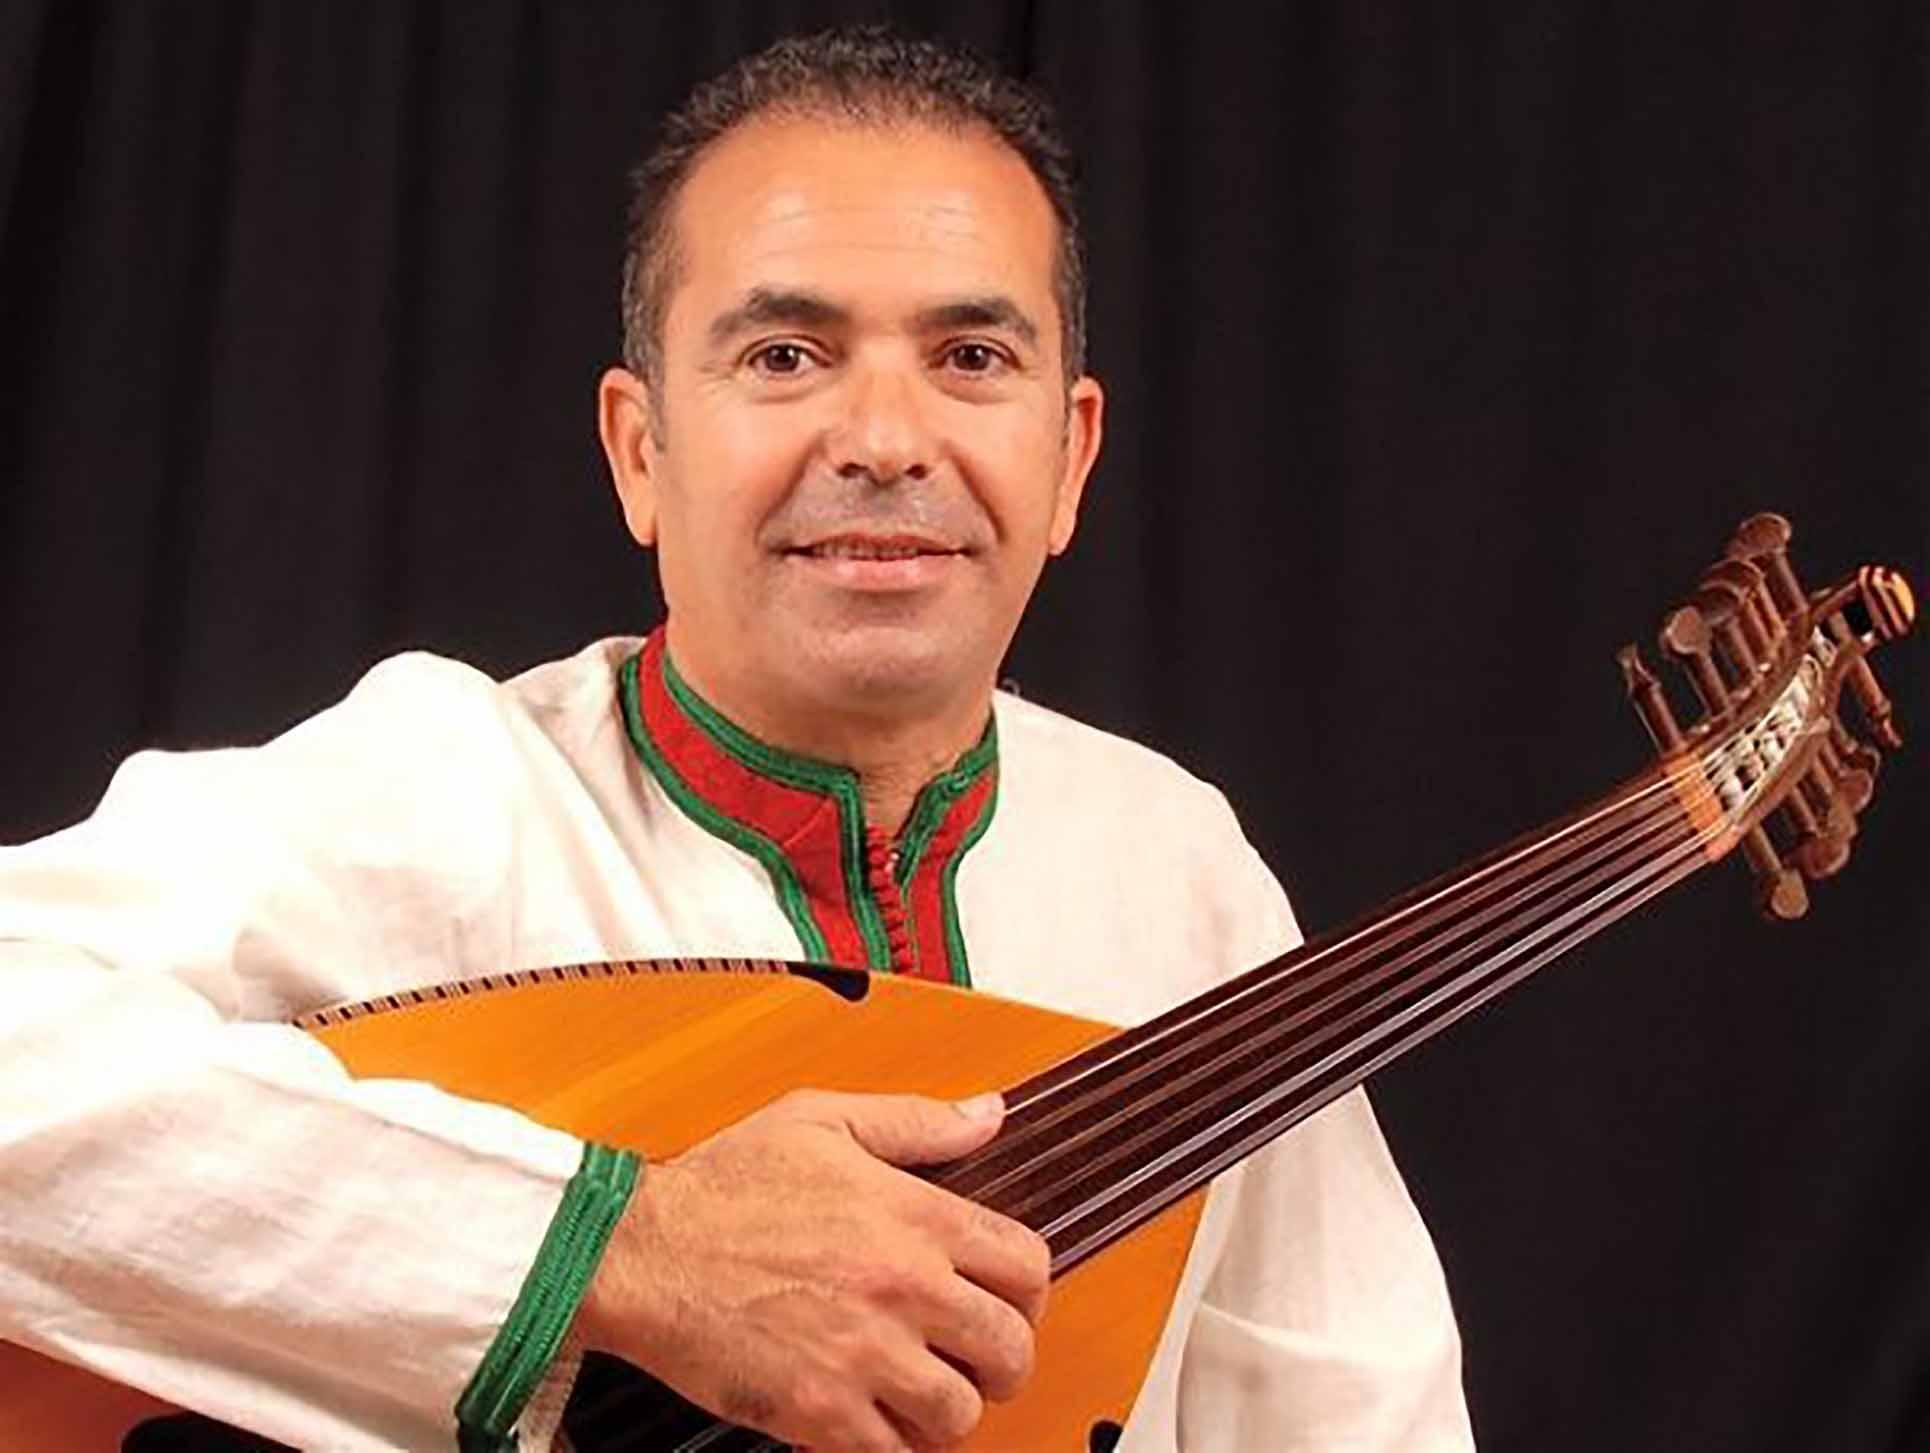 Nabil Khaldi ouvre le bal du Festival  international du raï d'Oujda